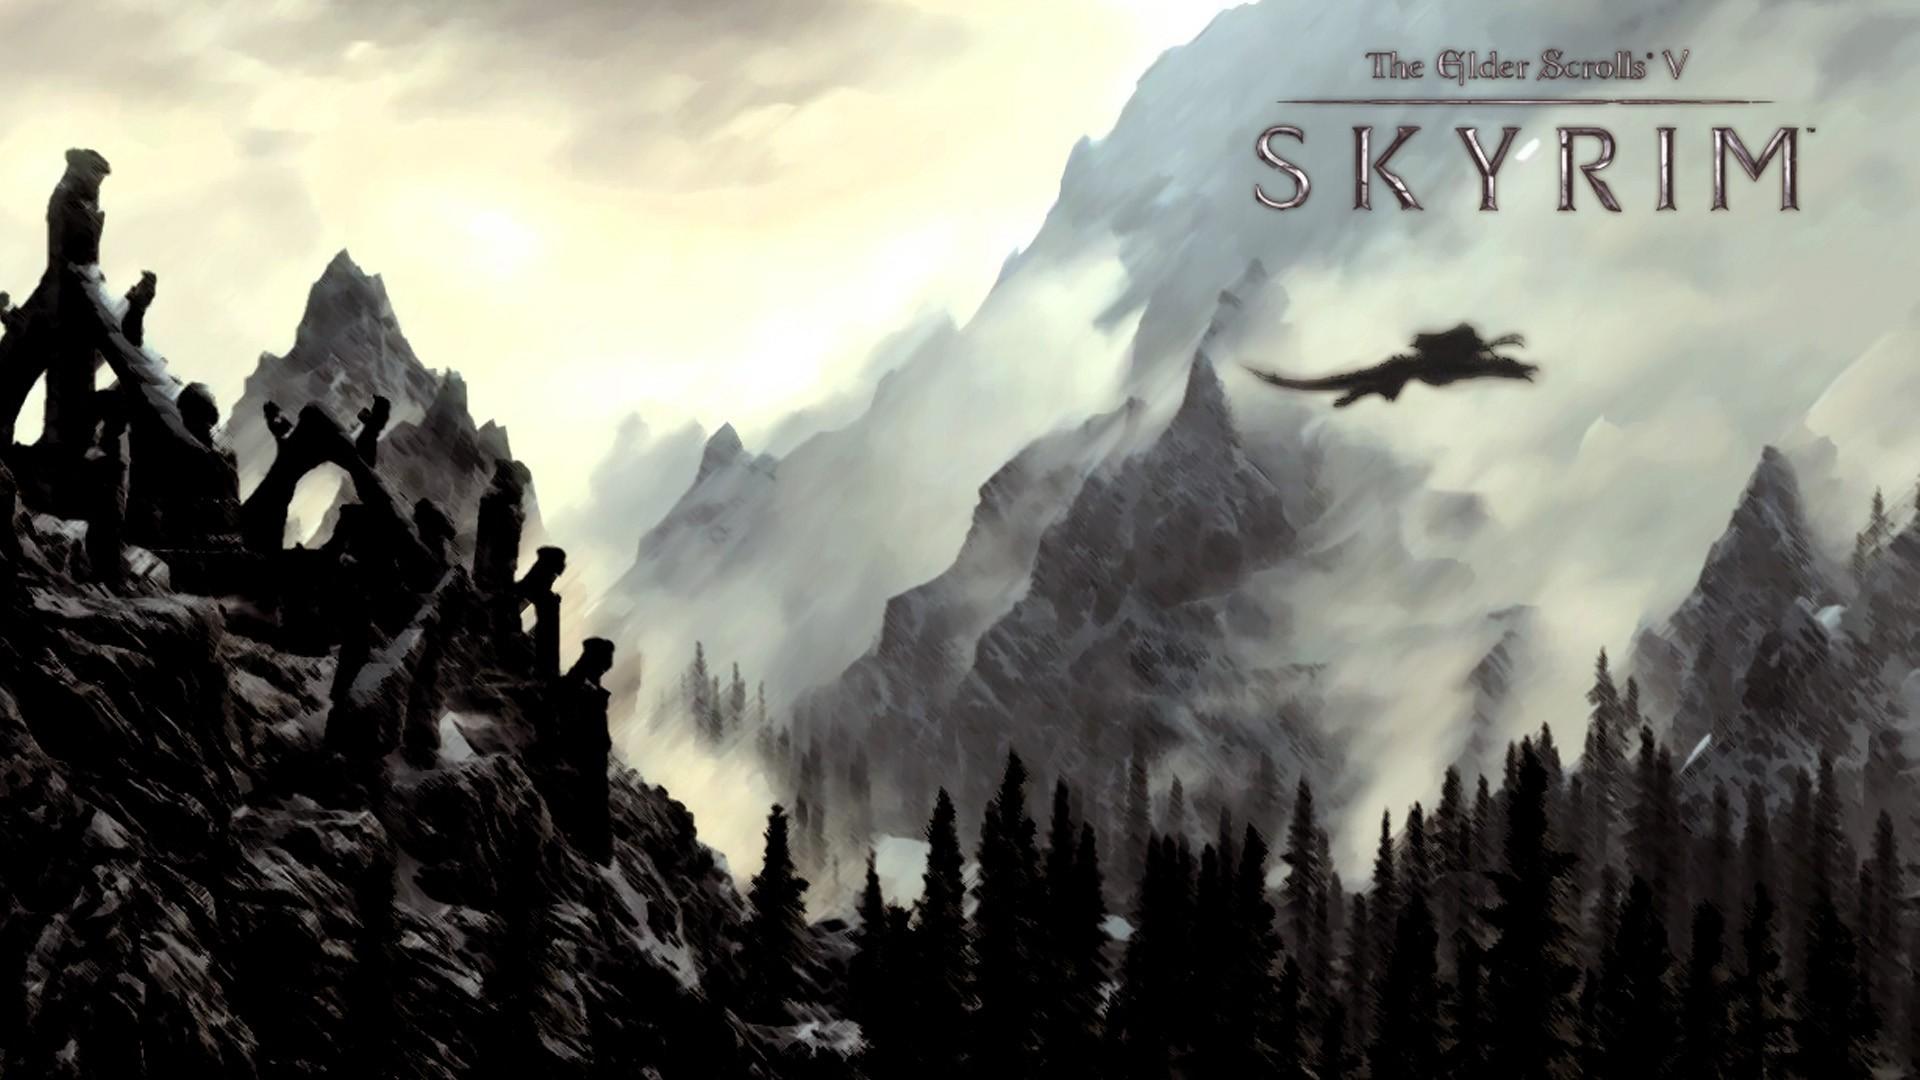 1920x1080 Skyrim HD Wallpapers Free Download. Download .